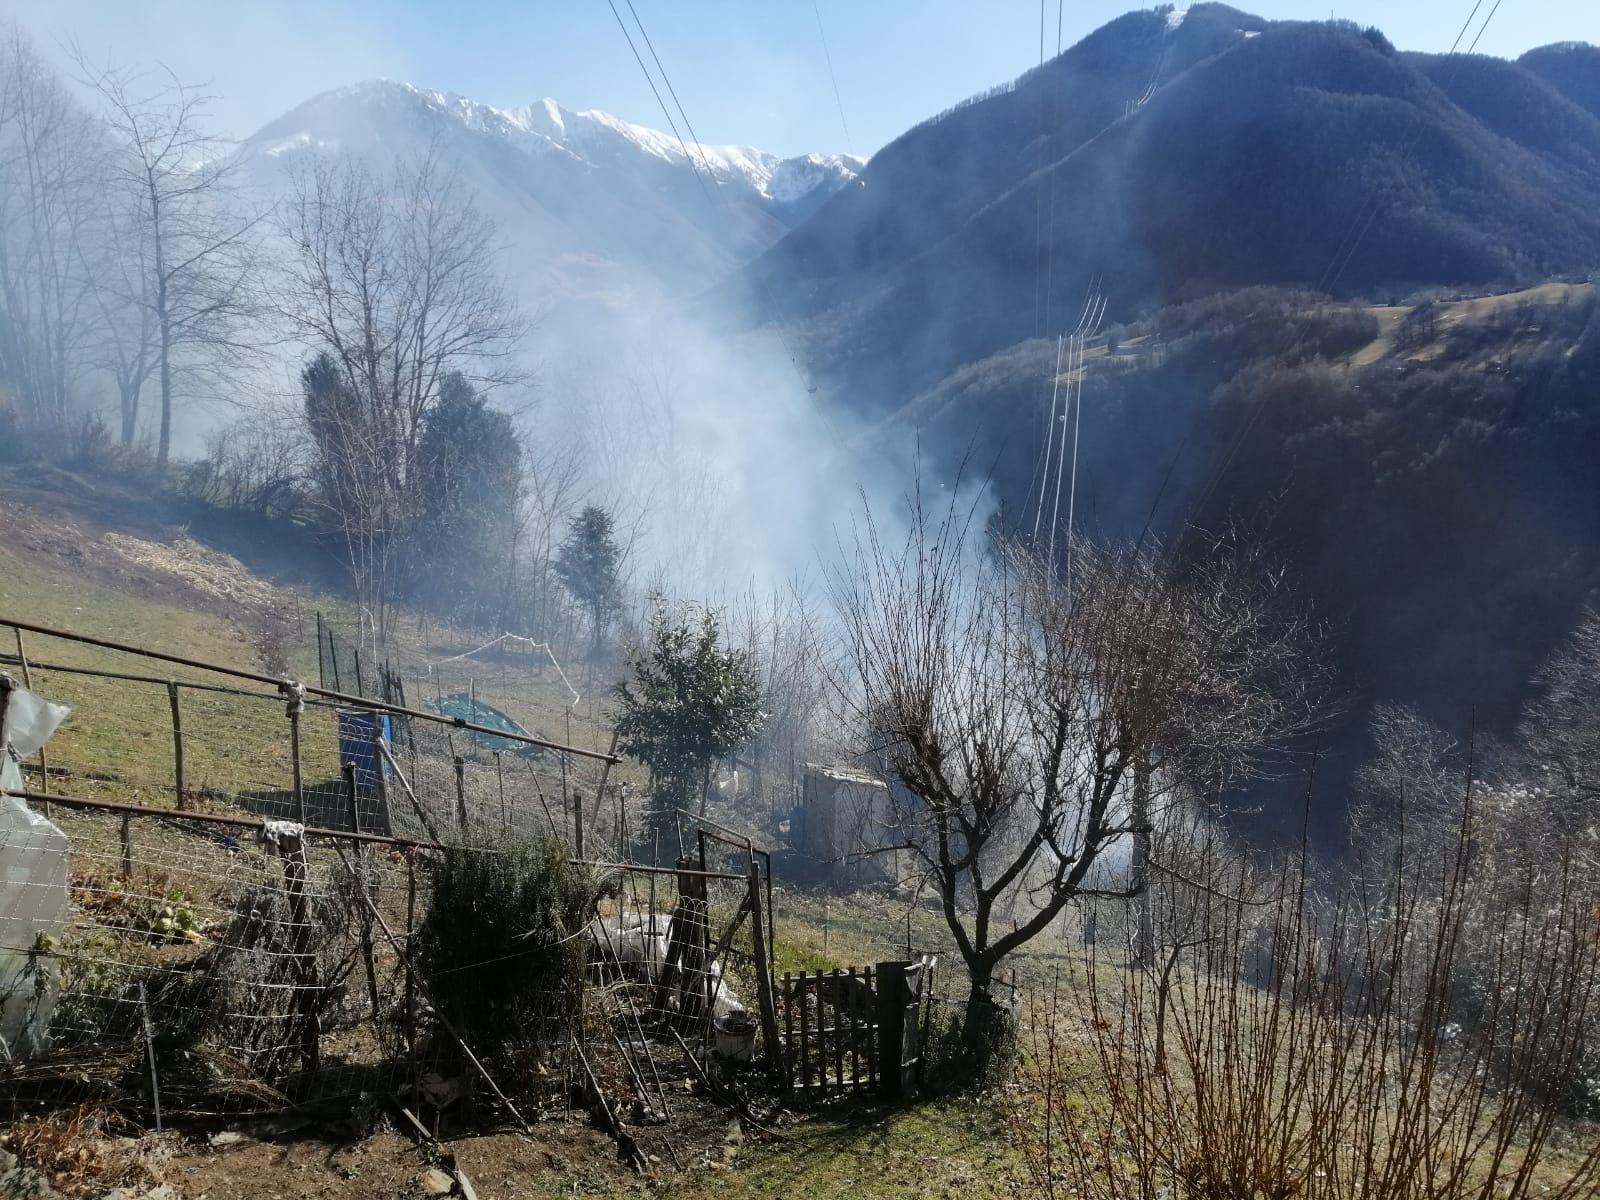 https://www.valsassinanews.com/wp-content/uploads/2020/02/incendio-pagnona-feb20-1.jpeg